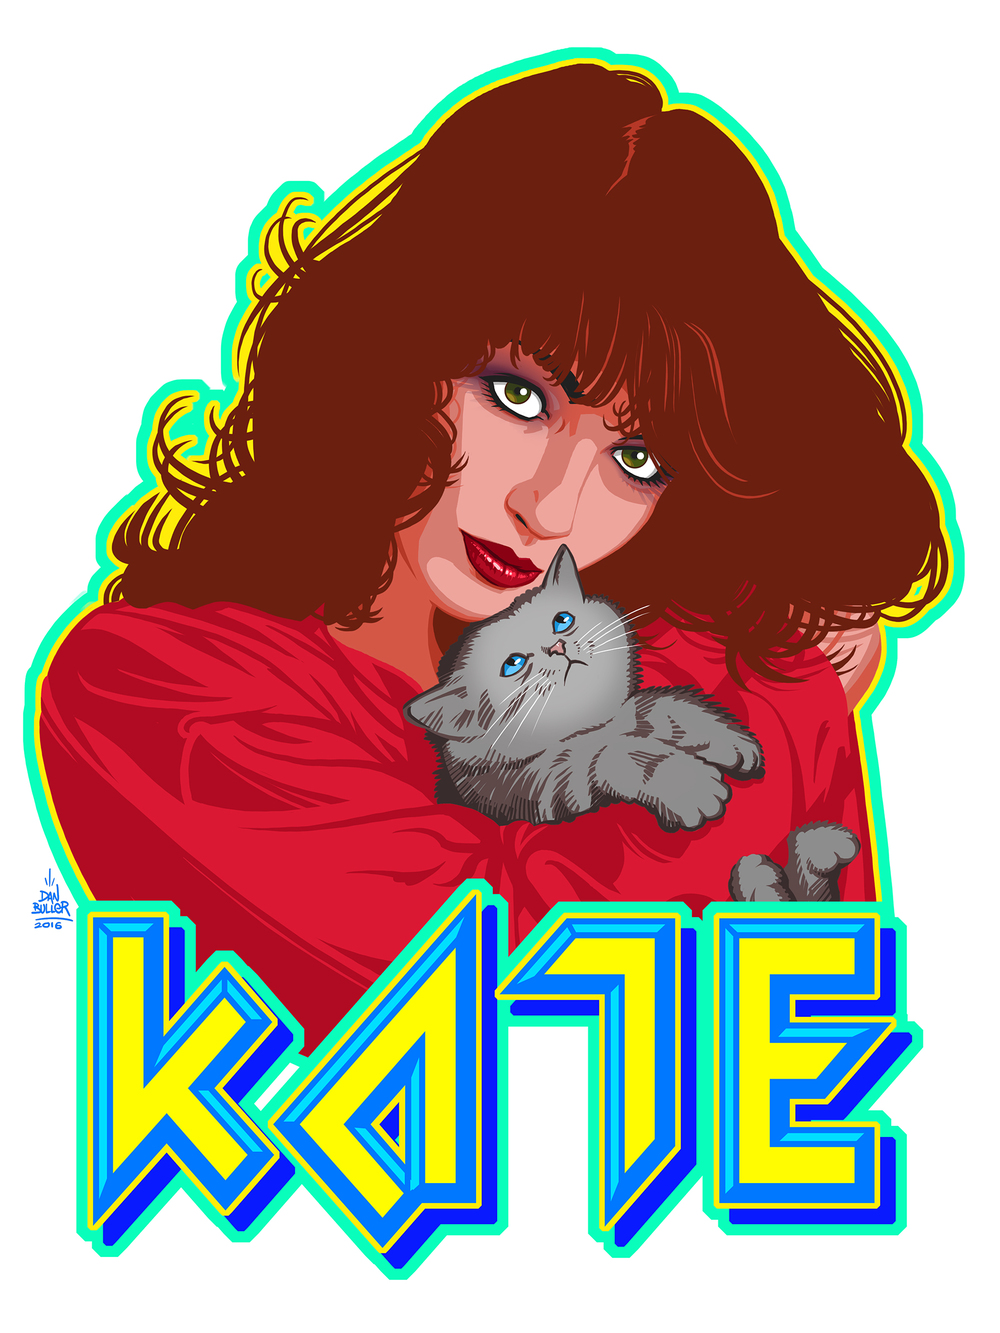 Kate and Babushka the Kitten